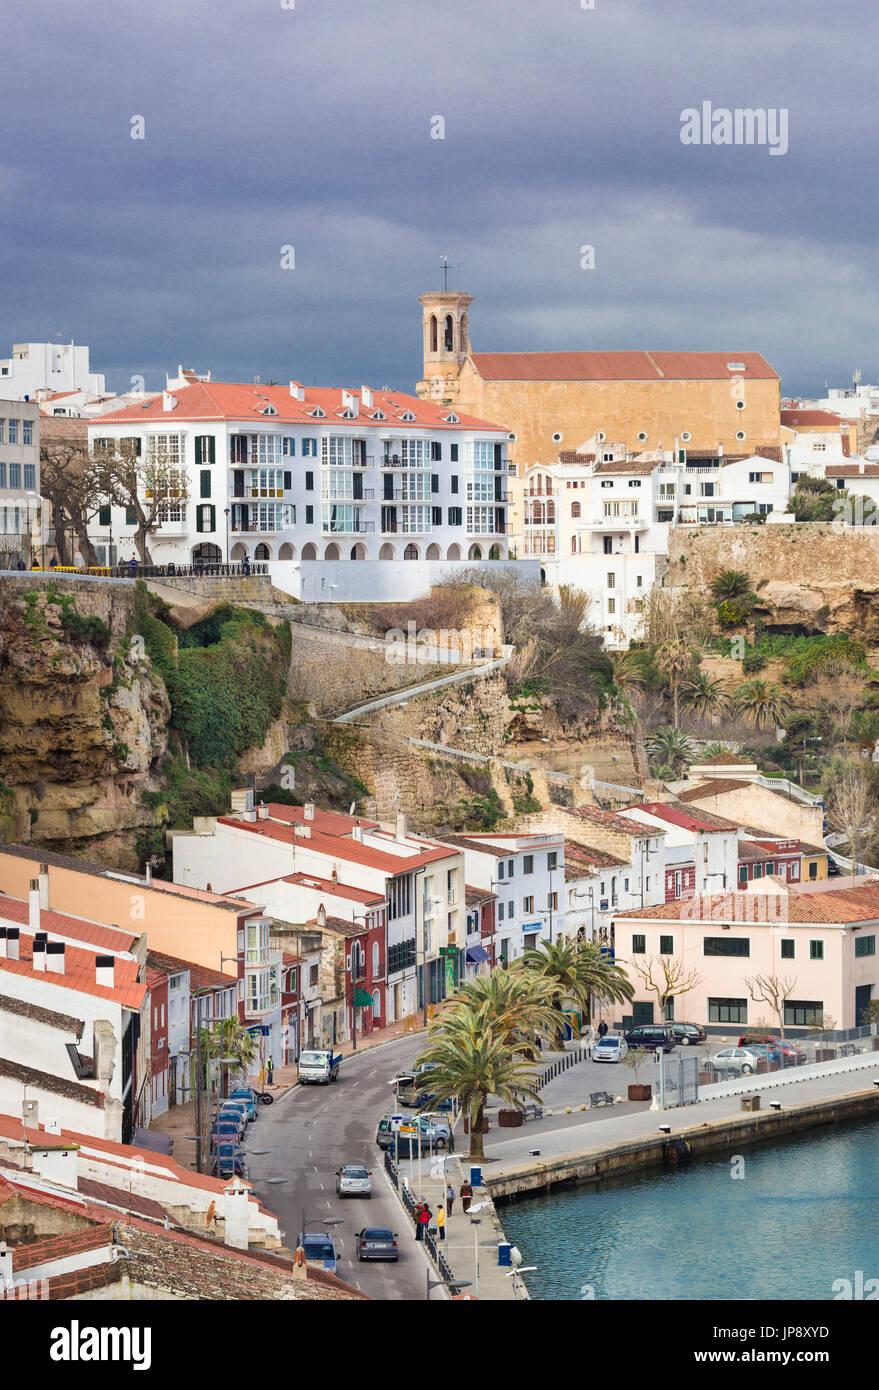 Spain balearic Islands, Menorca Island, Mao city skyline, - Stock Image